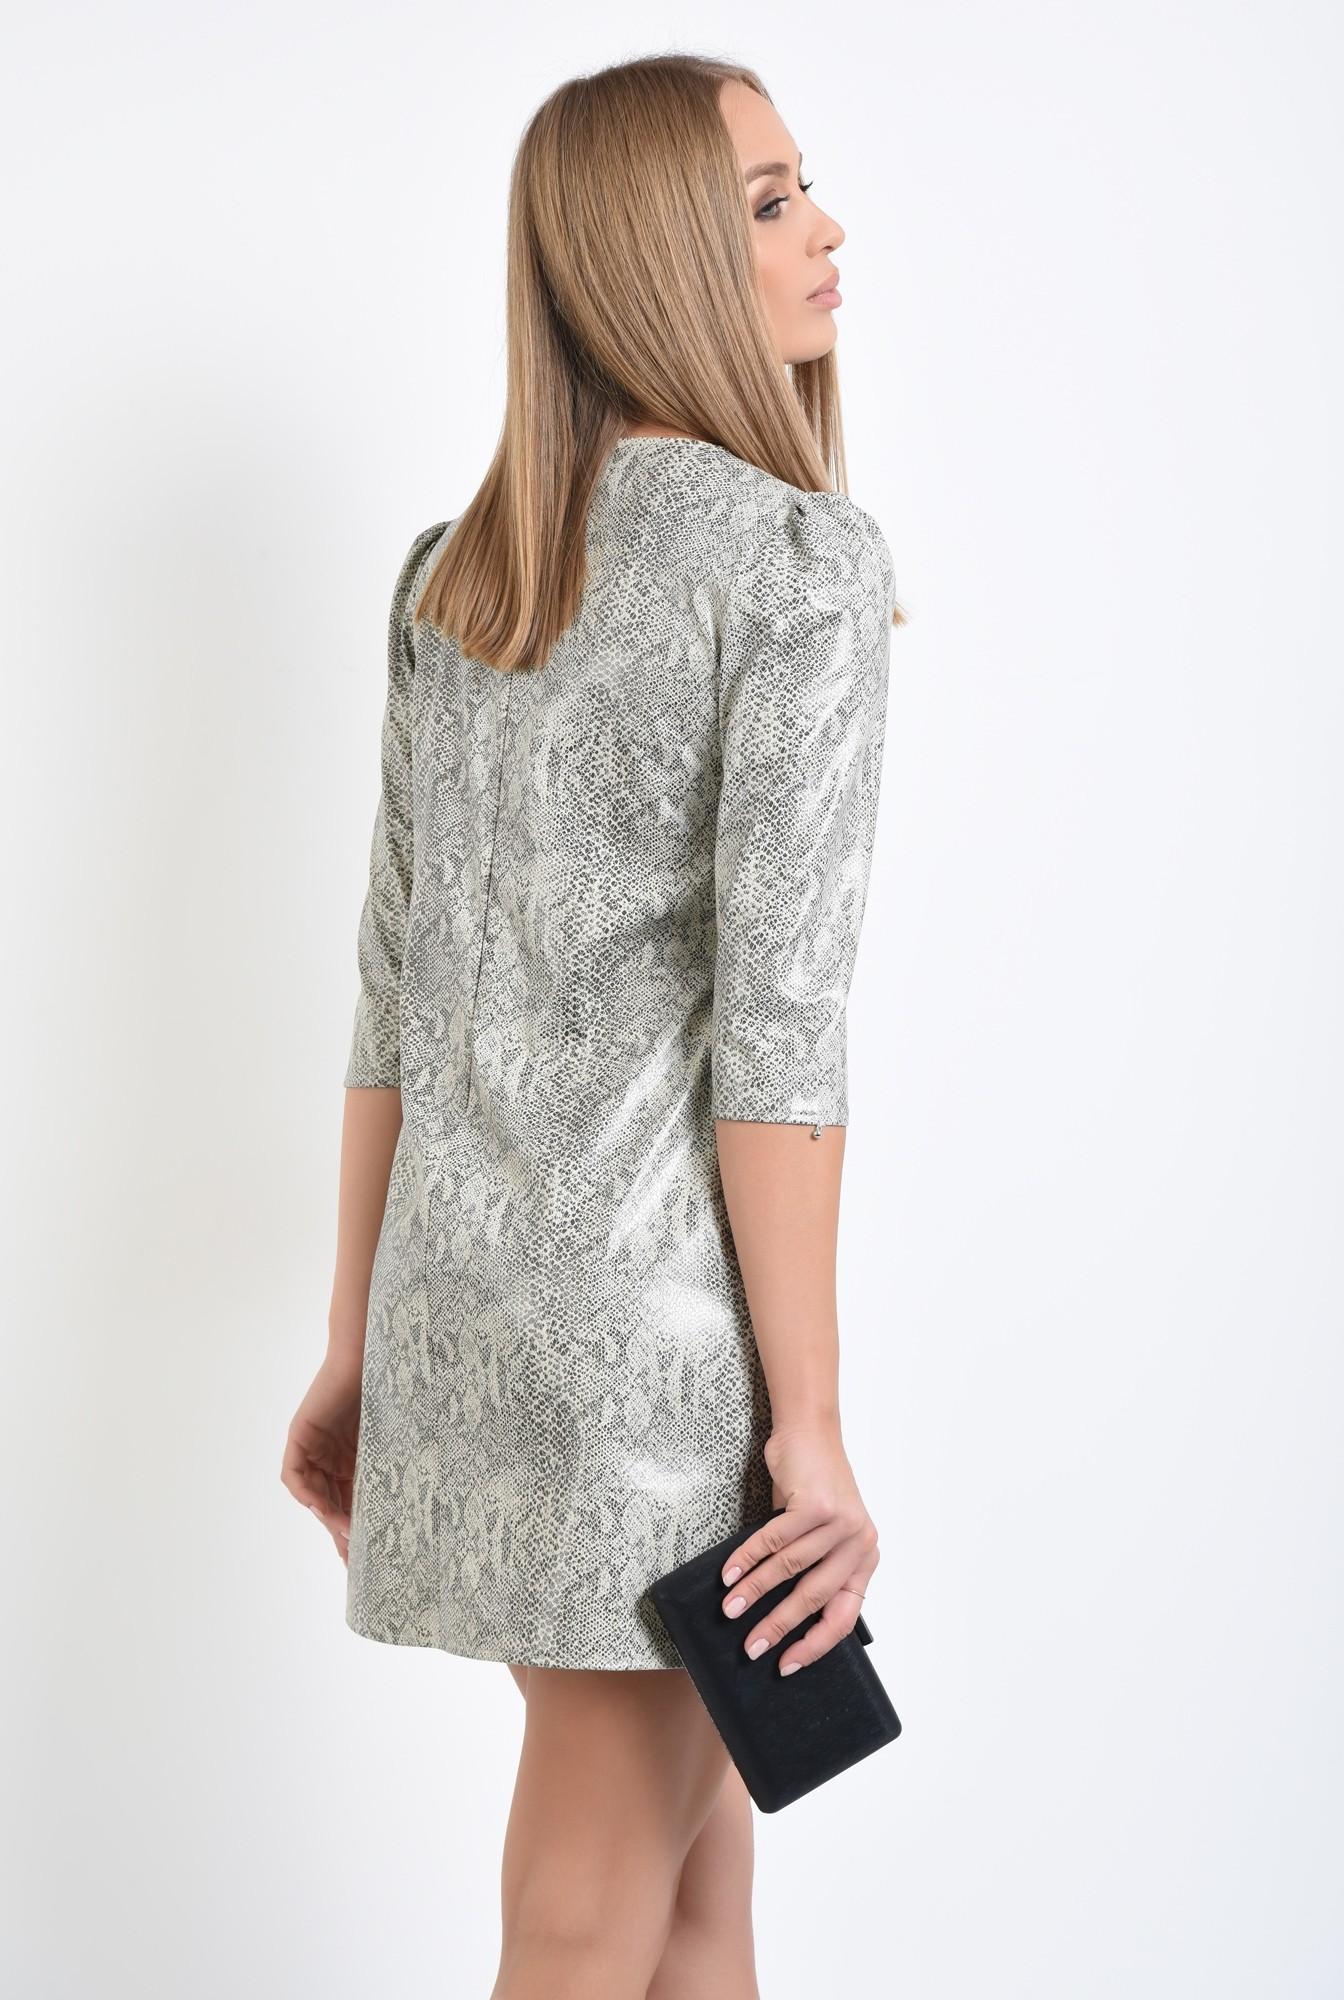 1 - rochie casual, piele eco, snakeskin, rochii online